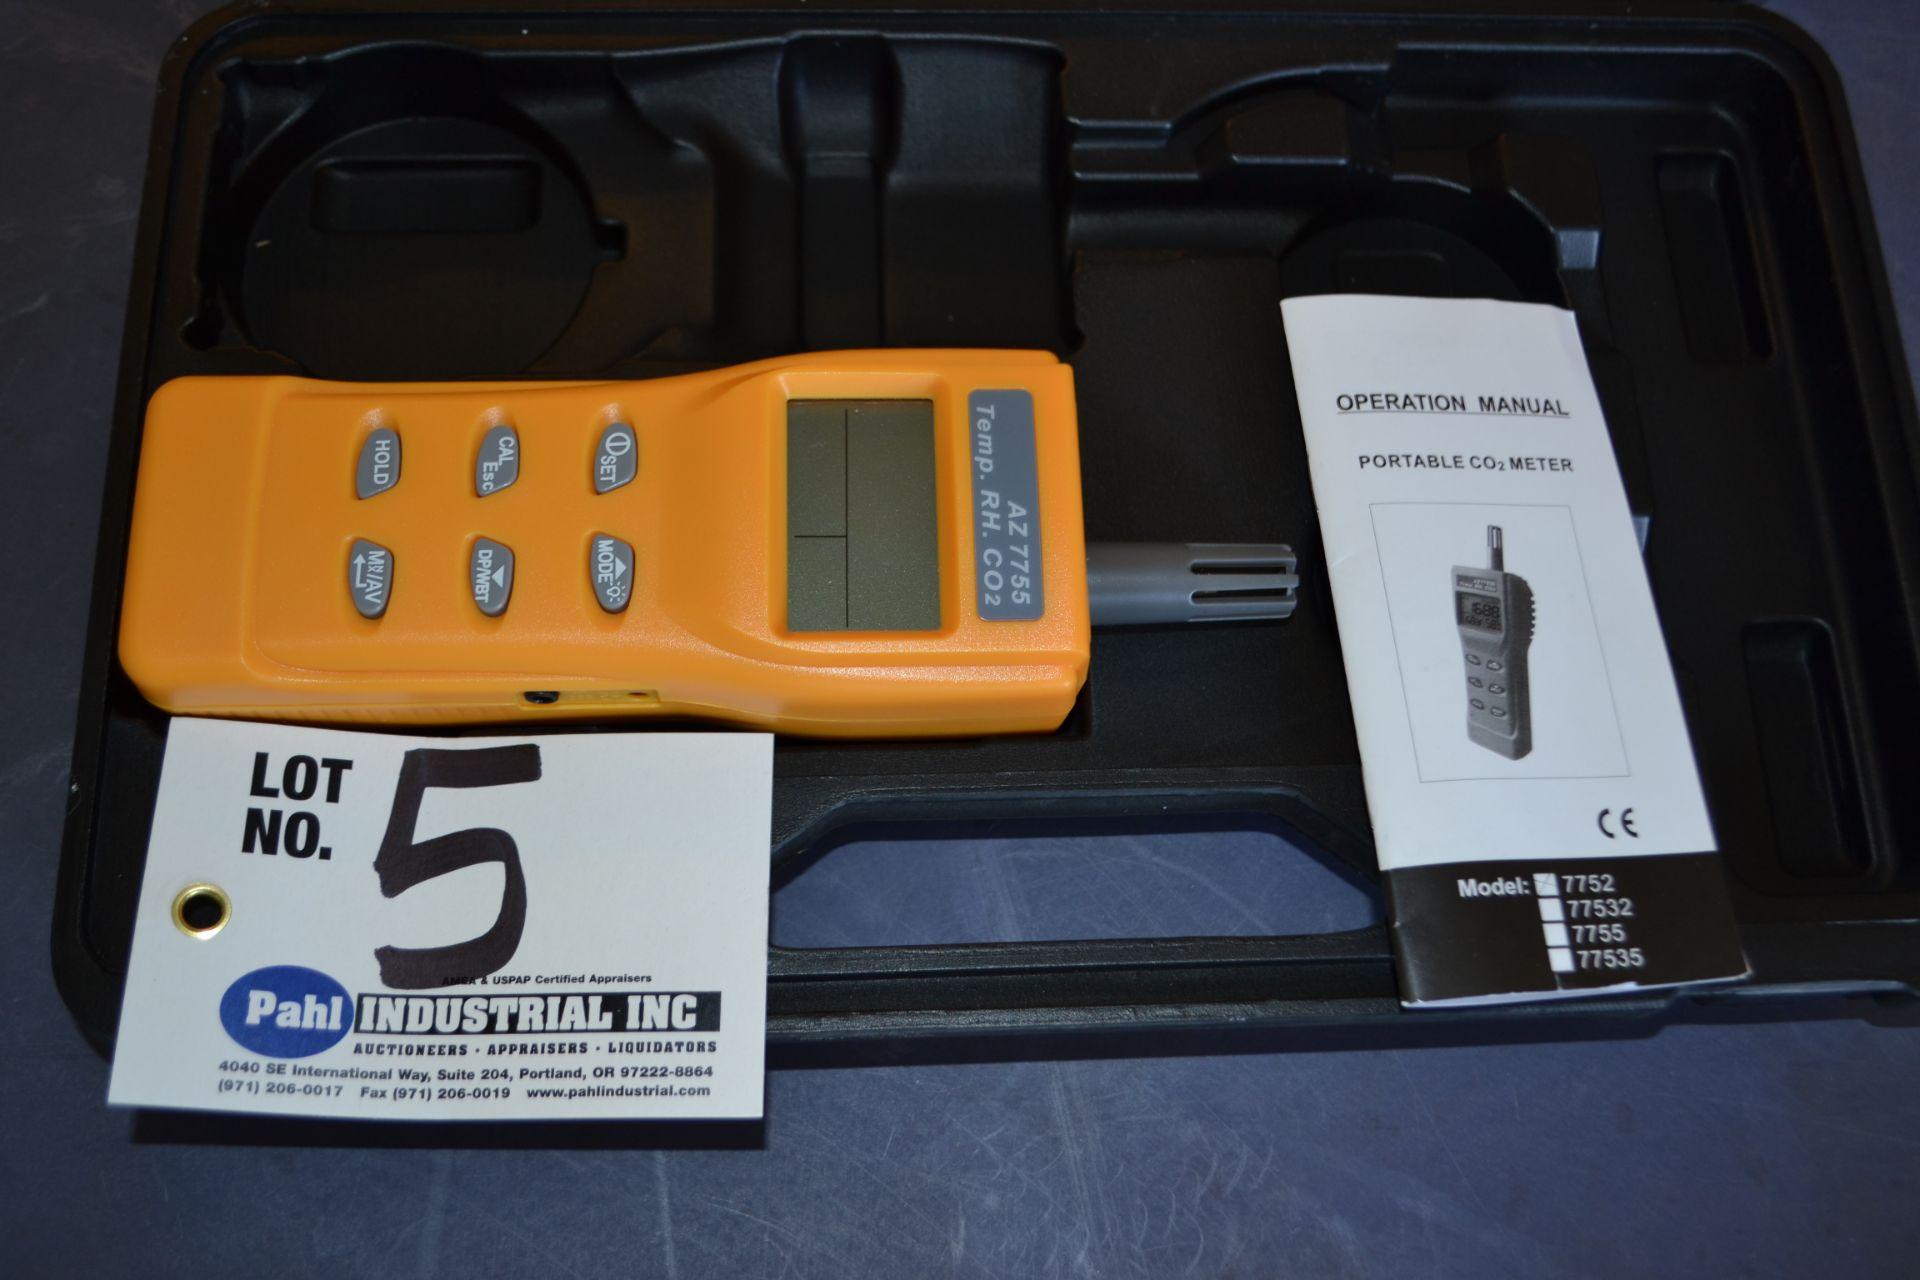 Lot 5 - Model AZ7755 Portable CO2 Meter